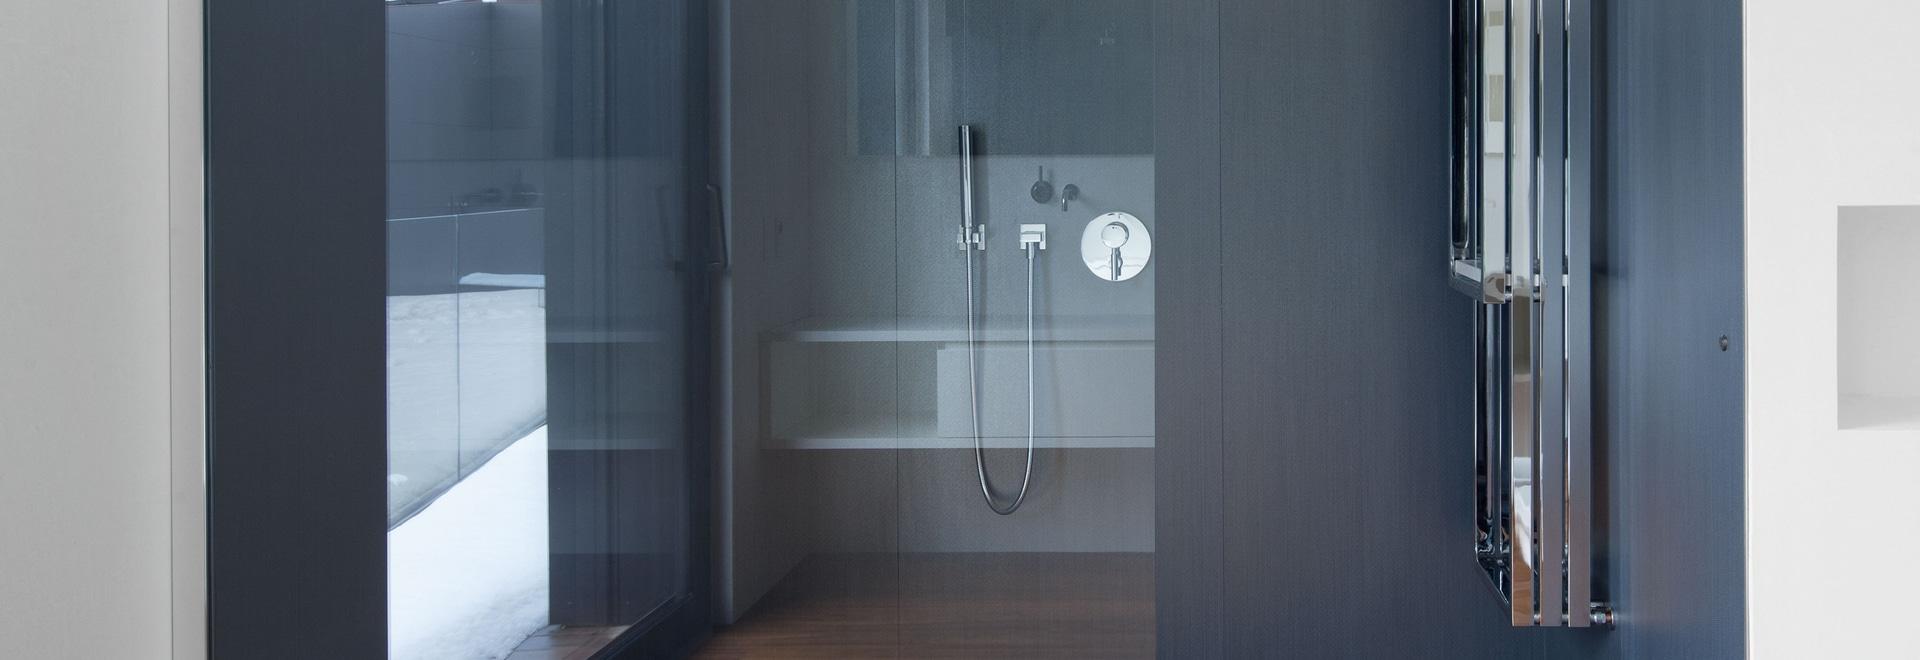 LAMINAM for the bathroom - Province of Modena, Italy - LAMINAM